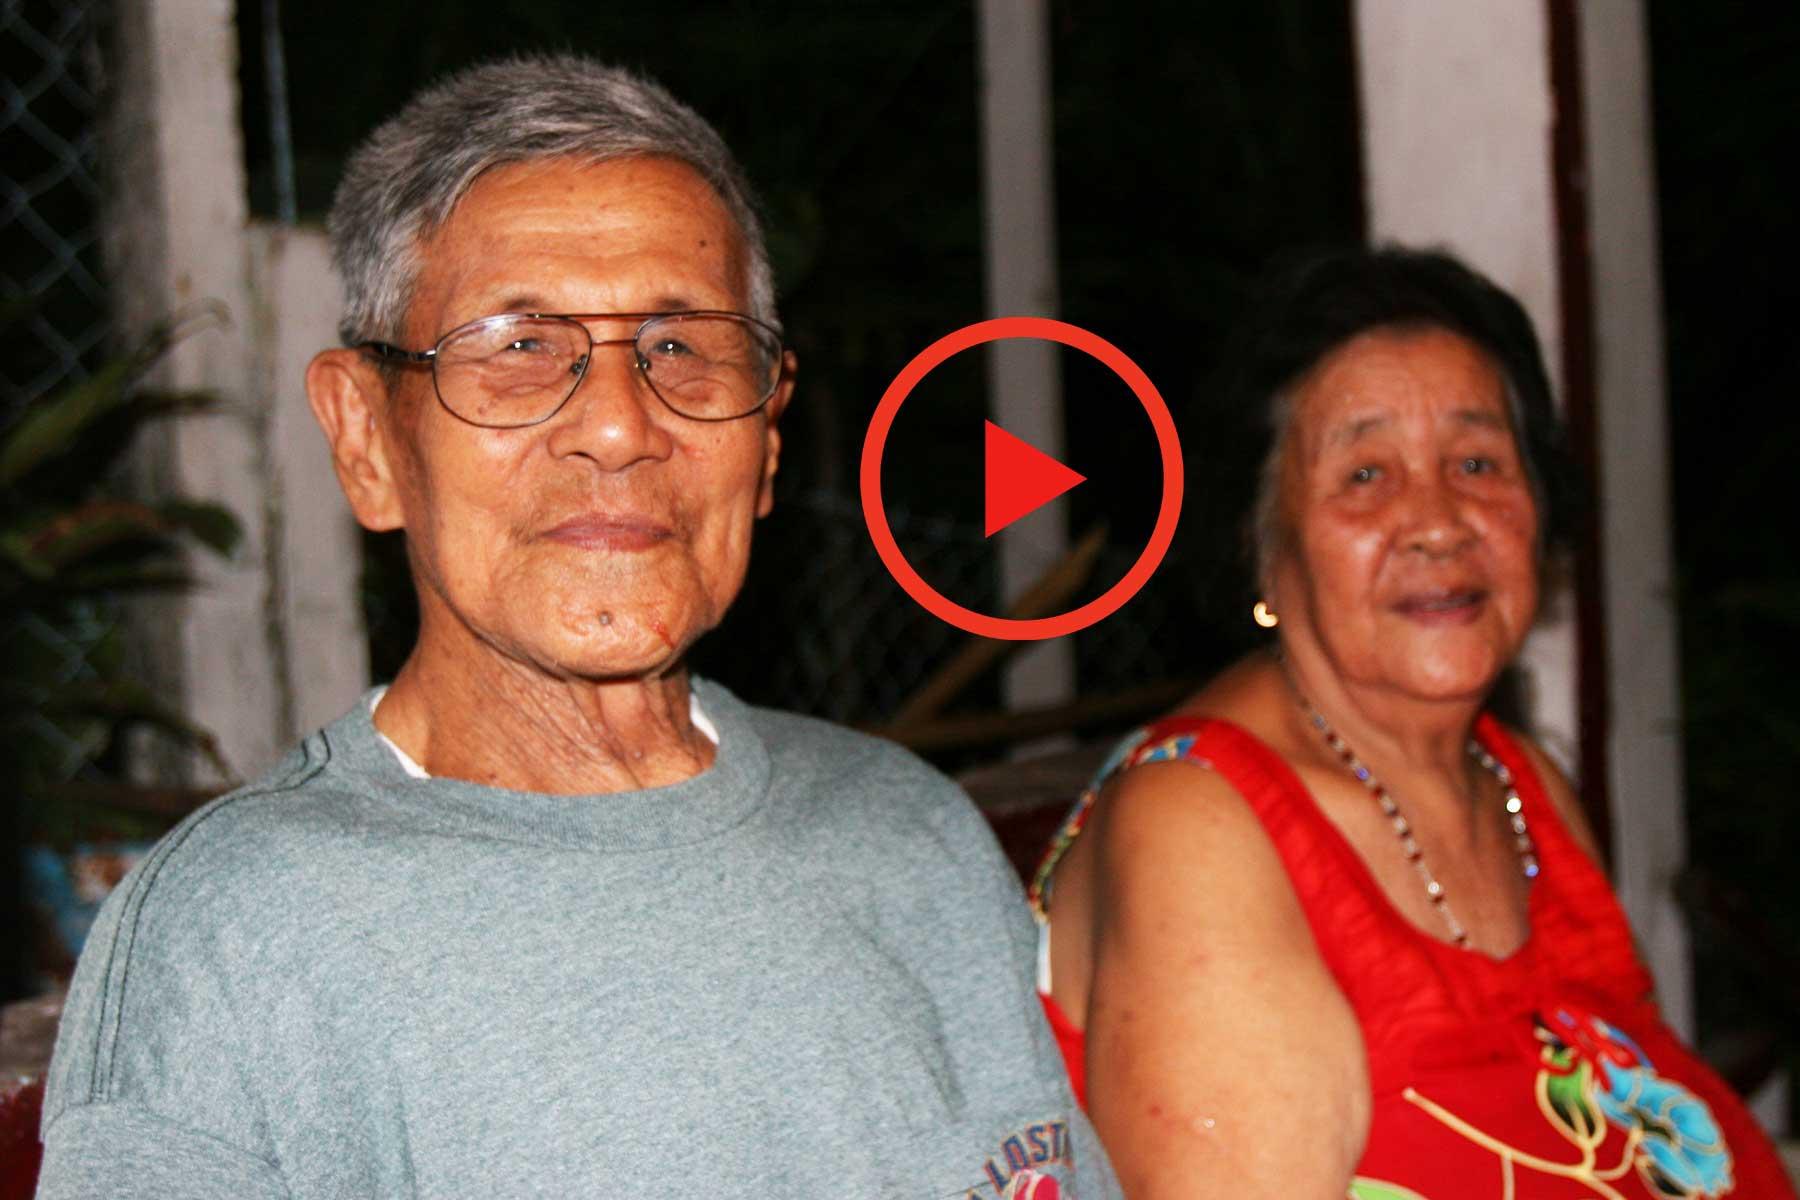 Batanes Islands Oral History Videos - Pablo and Anquilina Valientes - Ivana, Batan - David Blundell - Steven A Martin